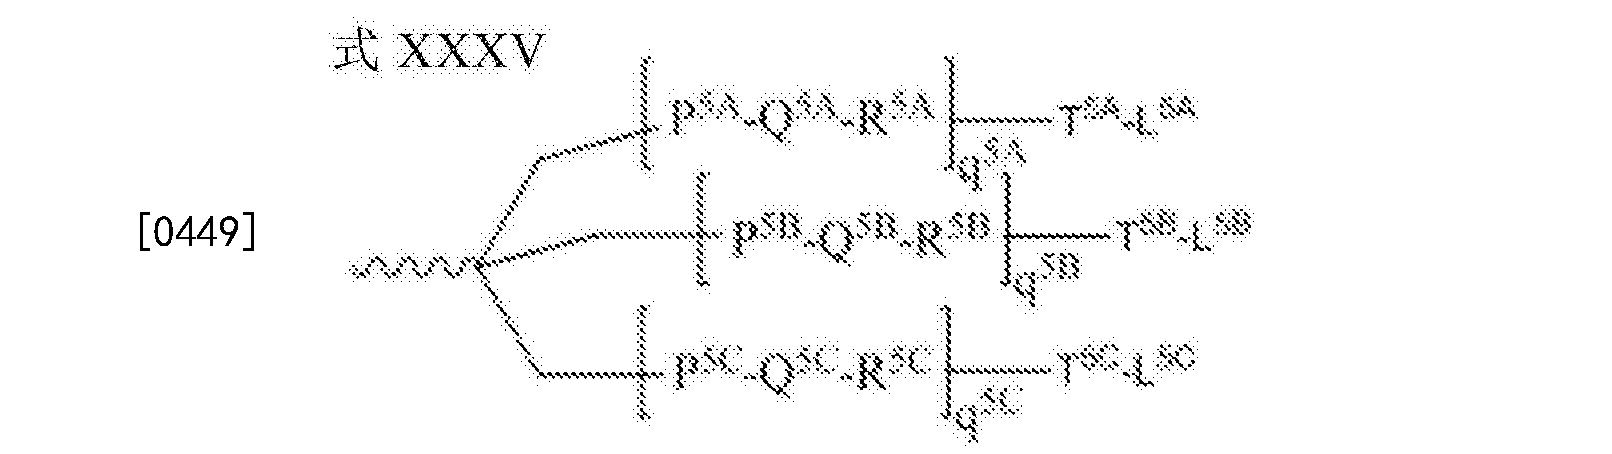 Figure CN108368507AD00691